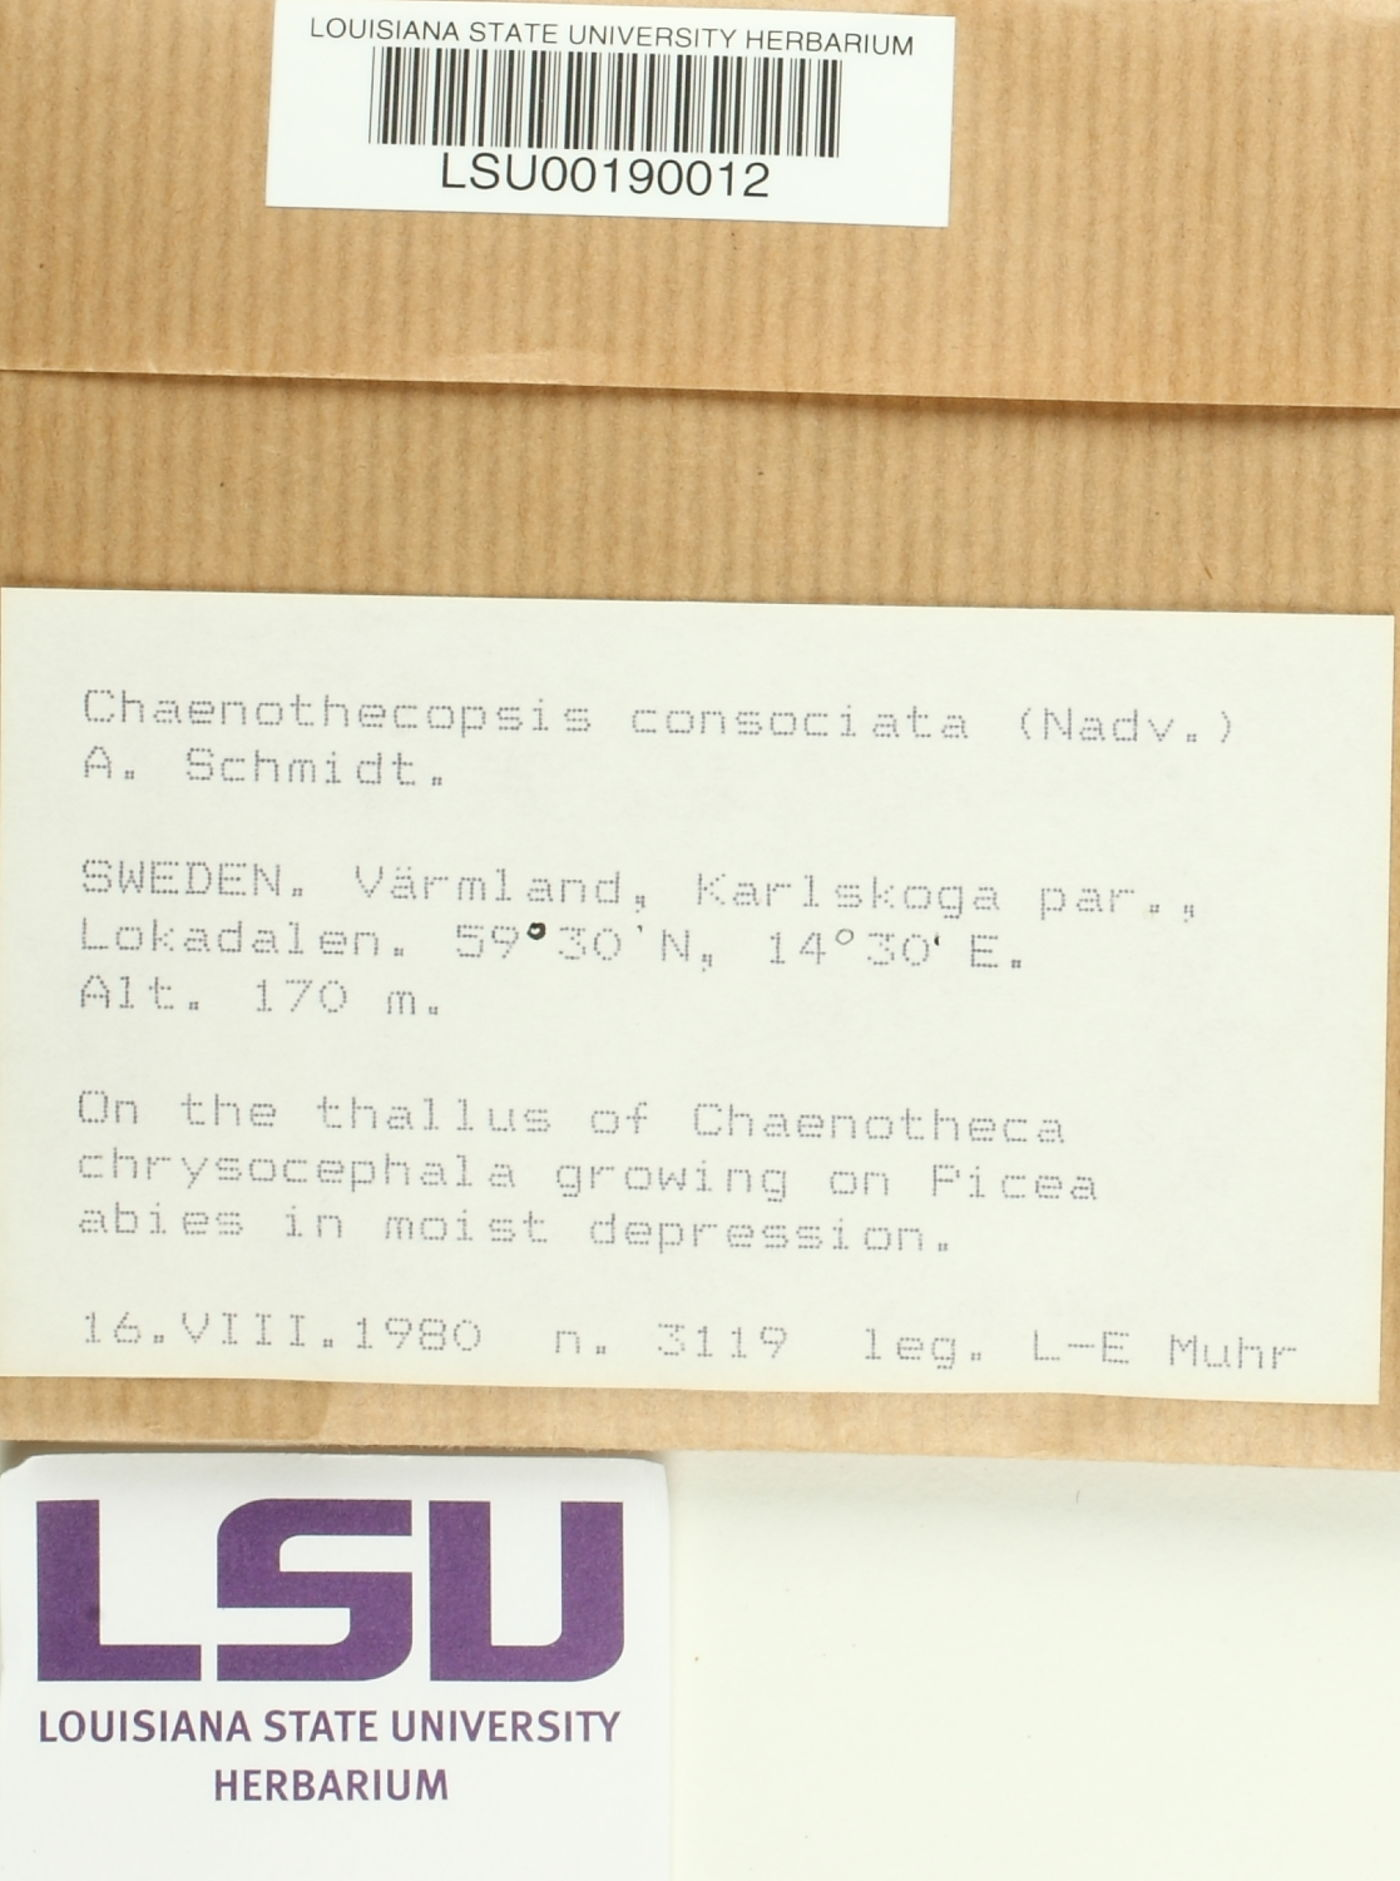 Chaenothecopsis consociata image